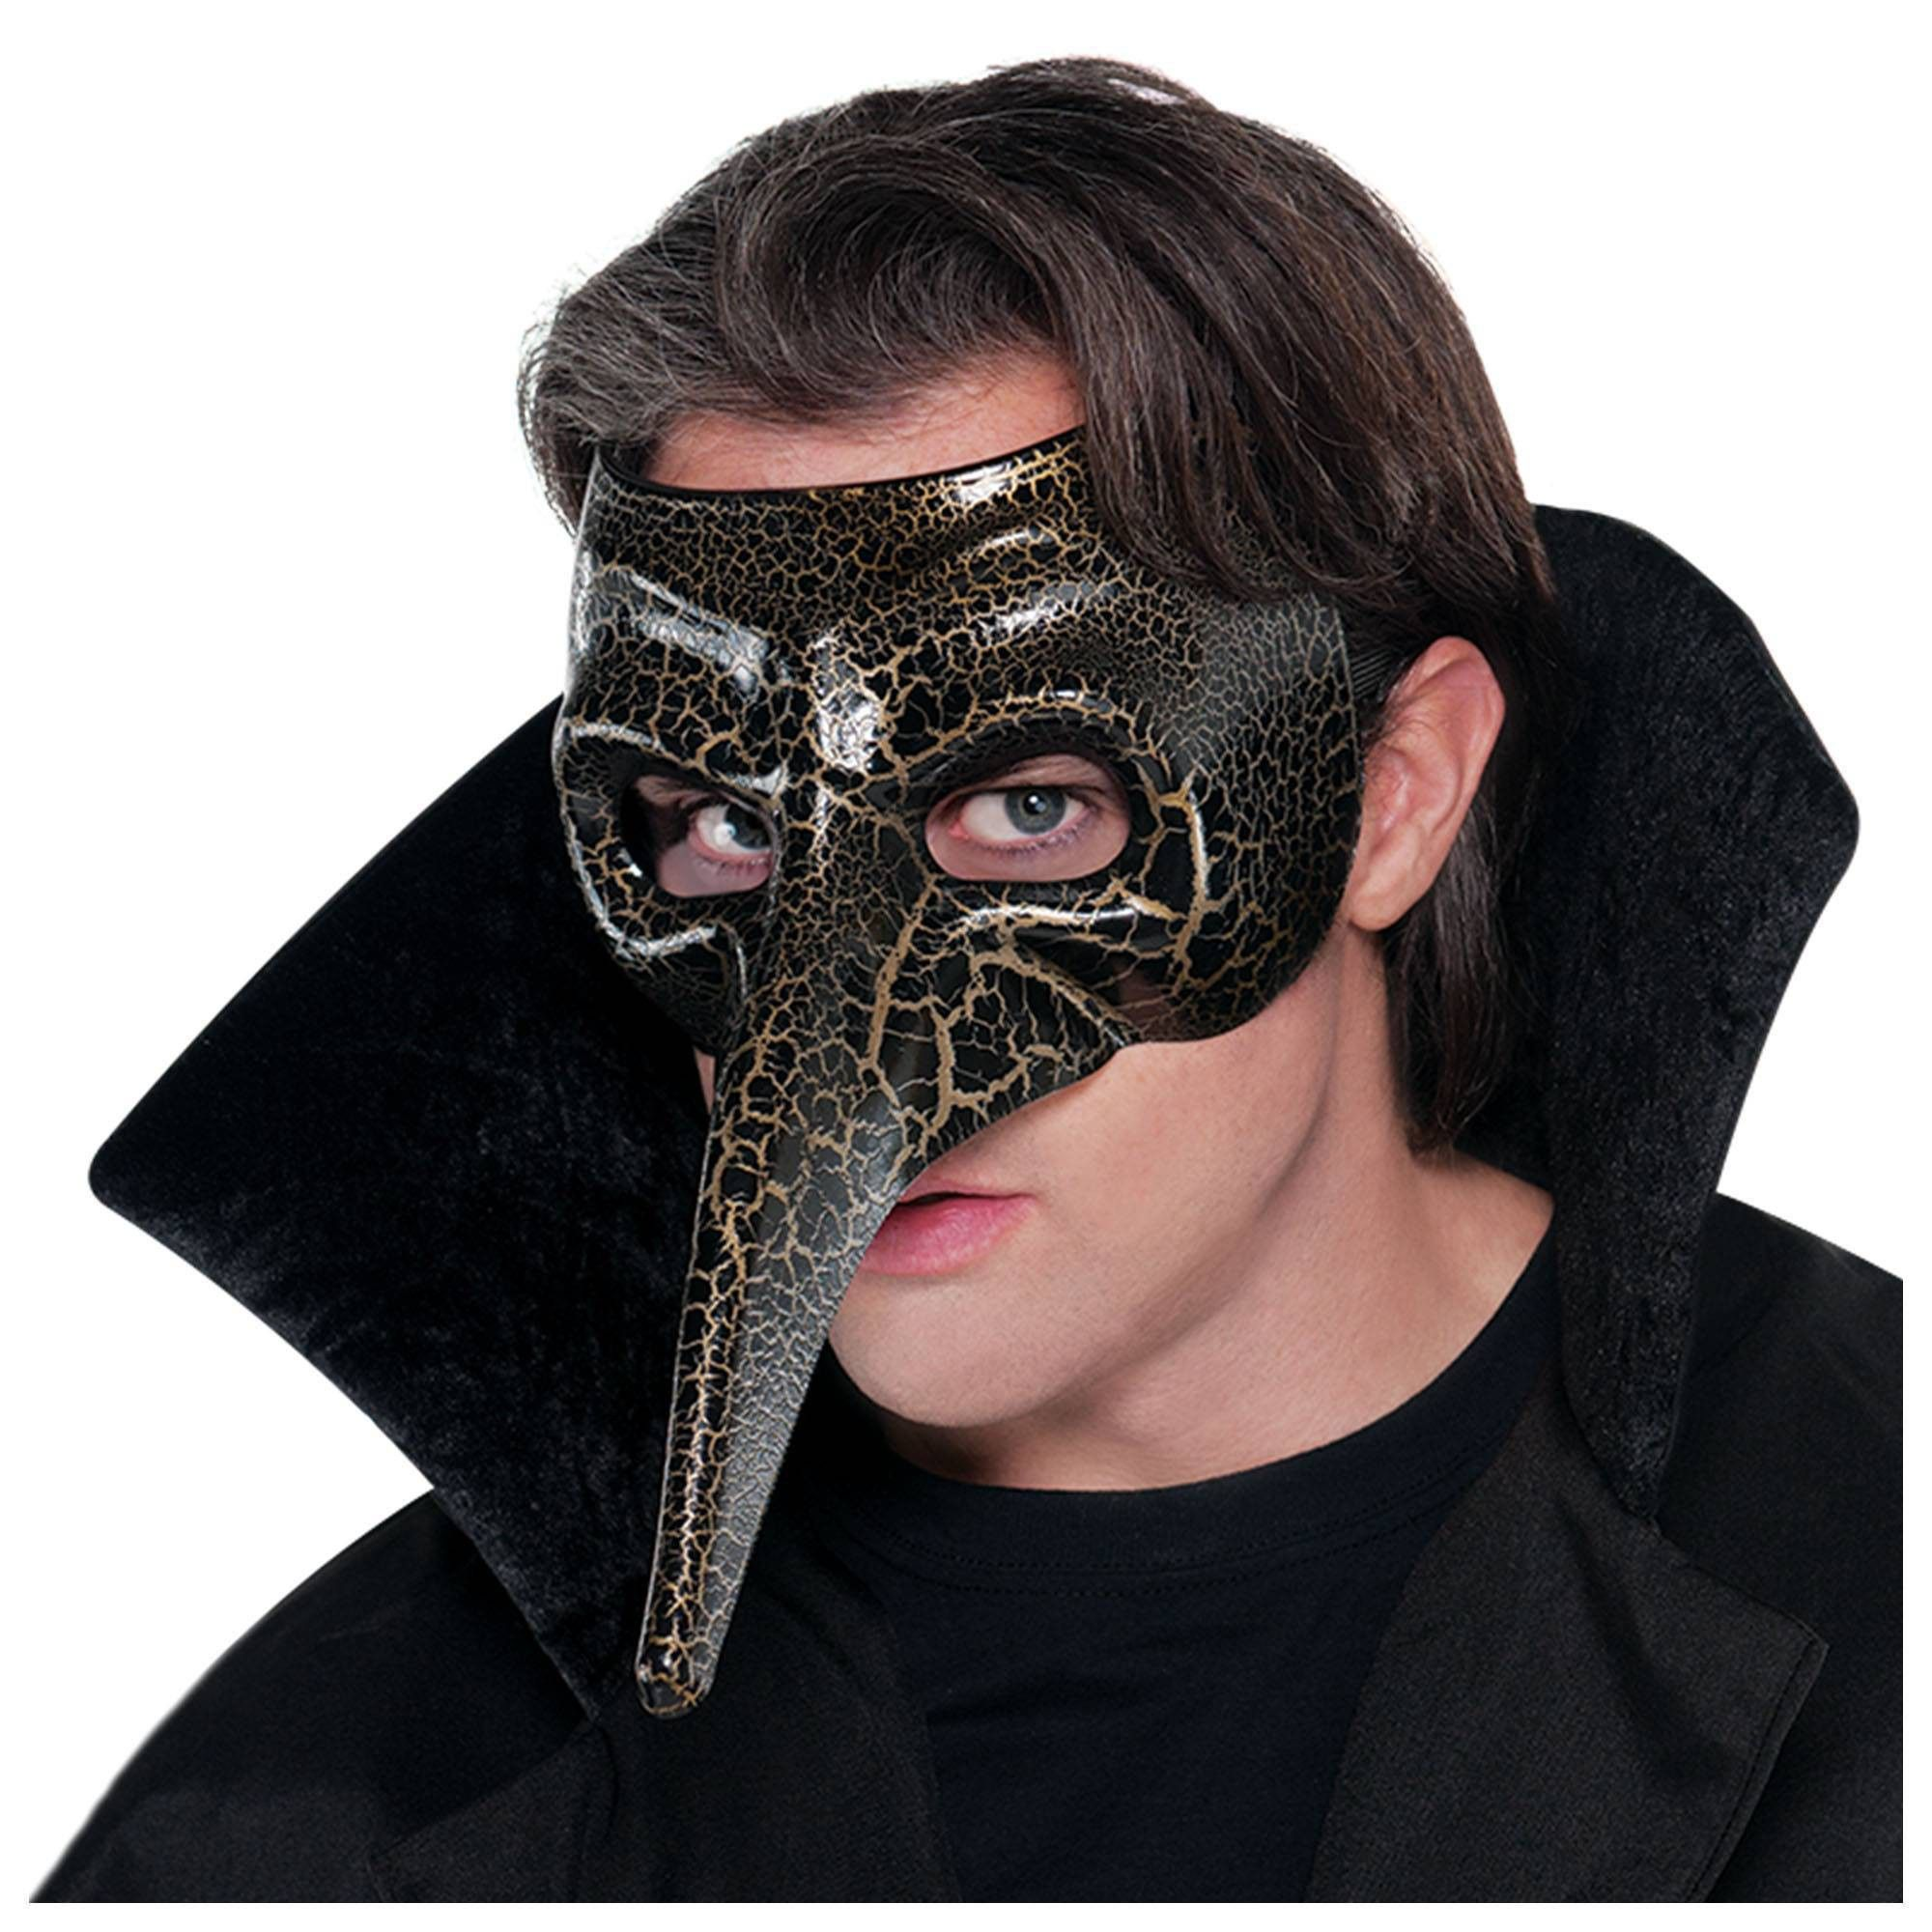 Halloween Fiend Halloween Costume Mask, Adult